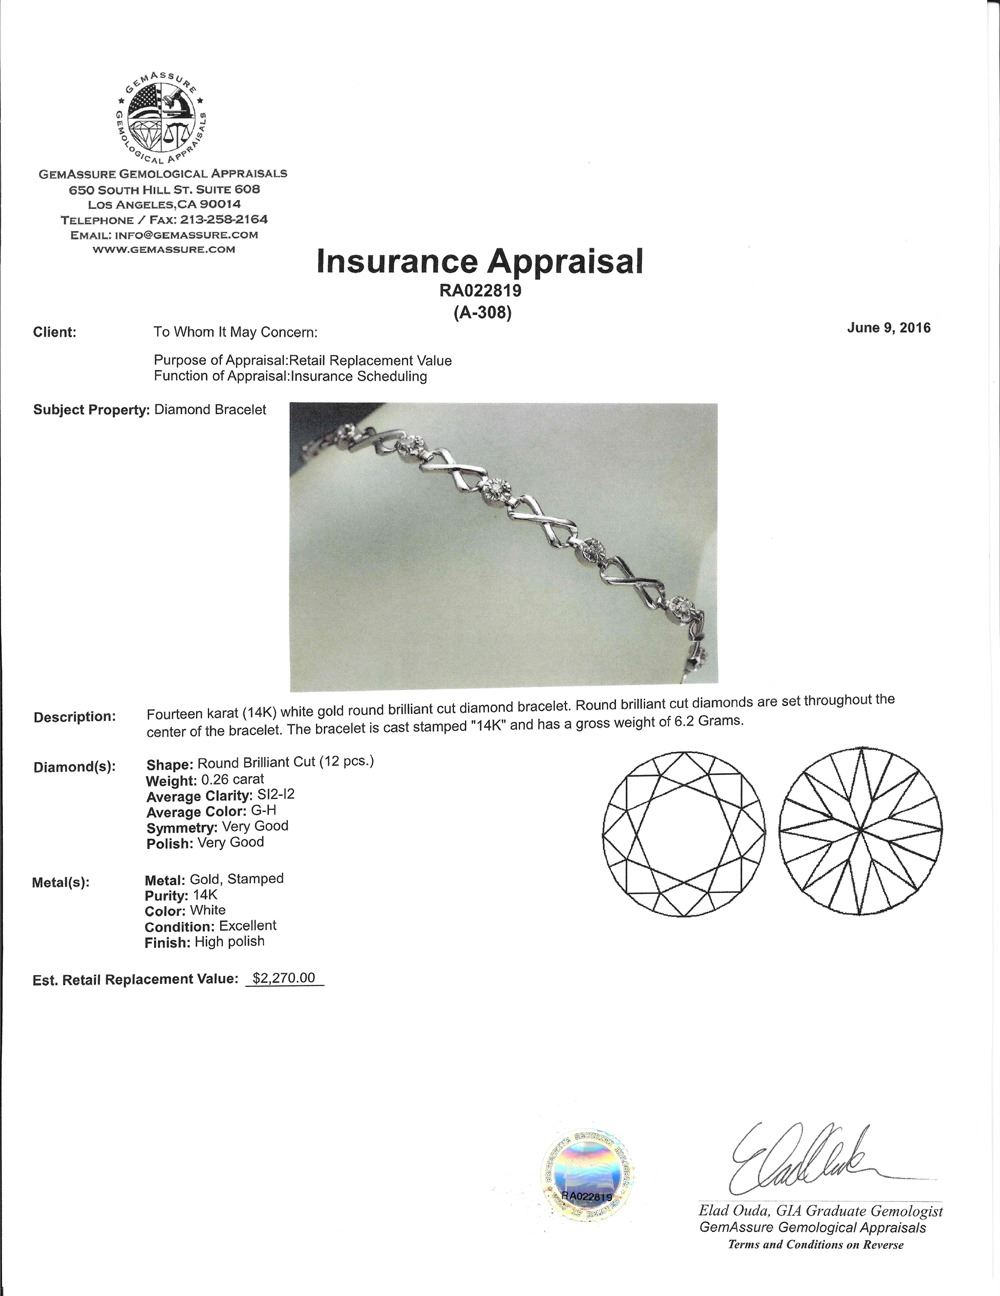 APP: 2 3k *Fine Jewelry 14KT White Gold, 0 26CT Round Brilliant Cut Diamond  Bracelet (VGN A-308) (Va